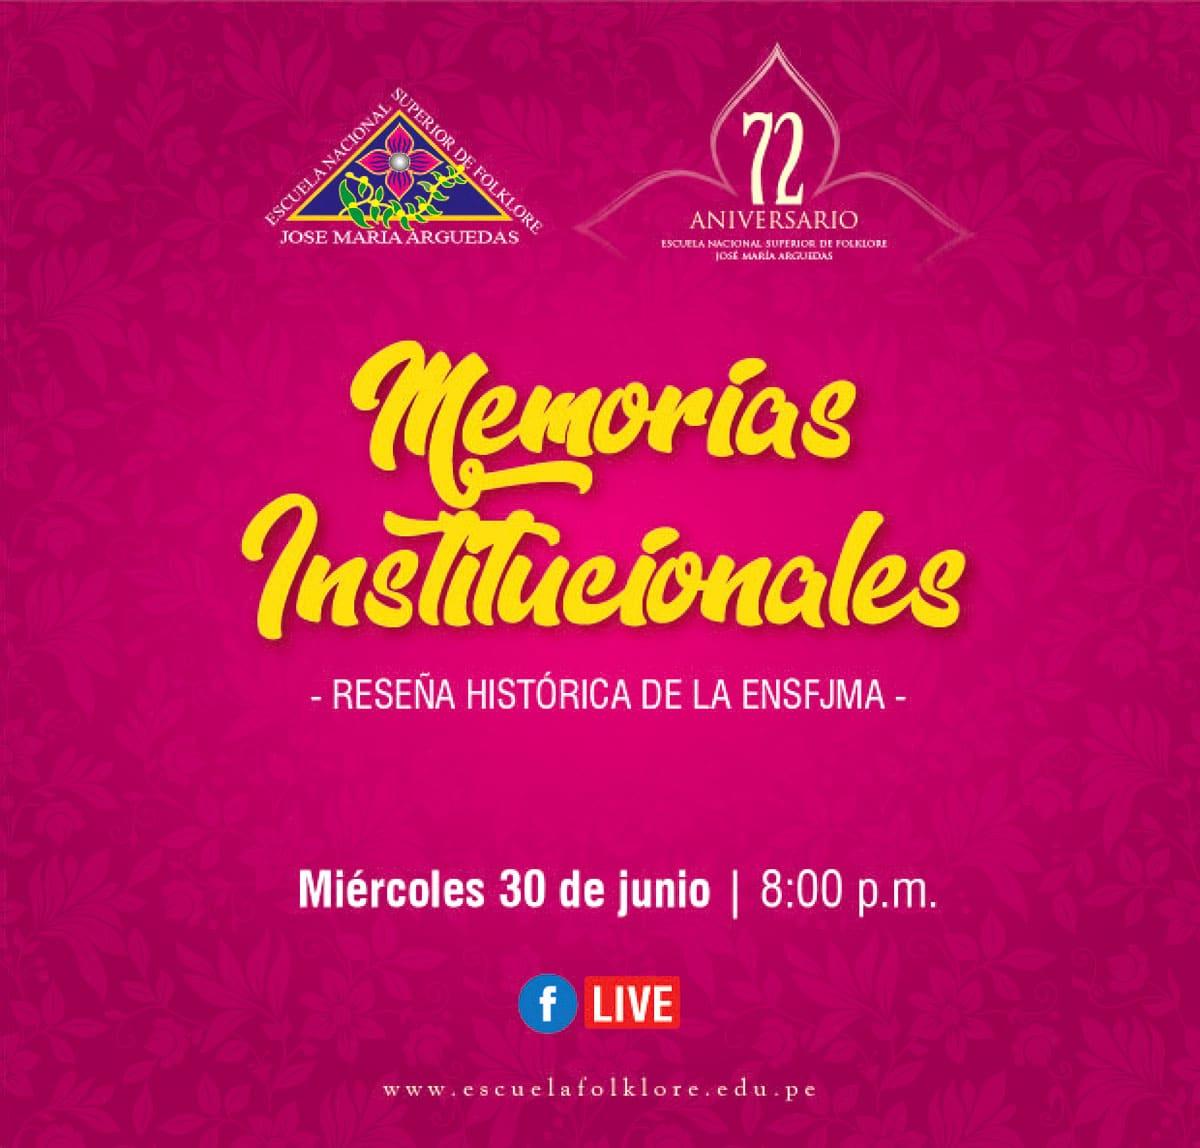 MEMORIAS INSTITUCIONALES – RESEÑA HISTÓRICA